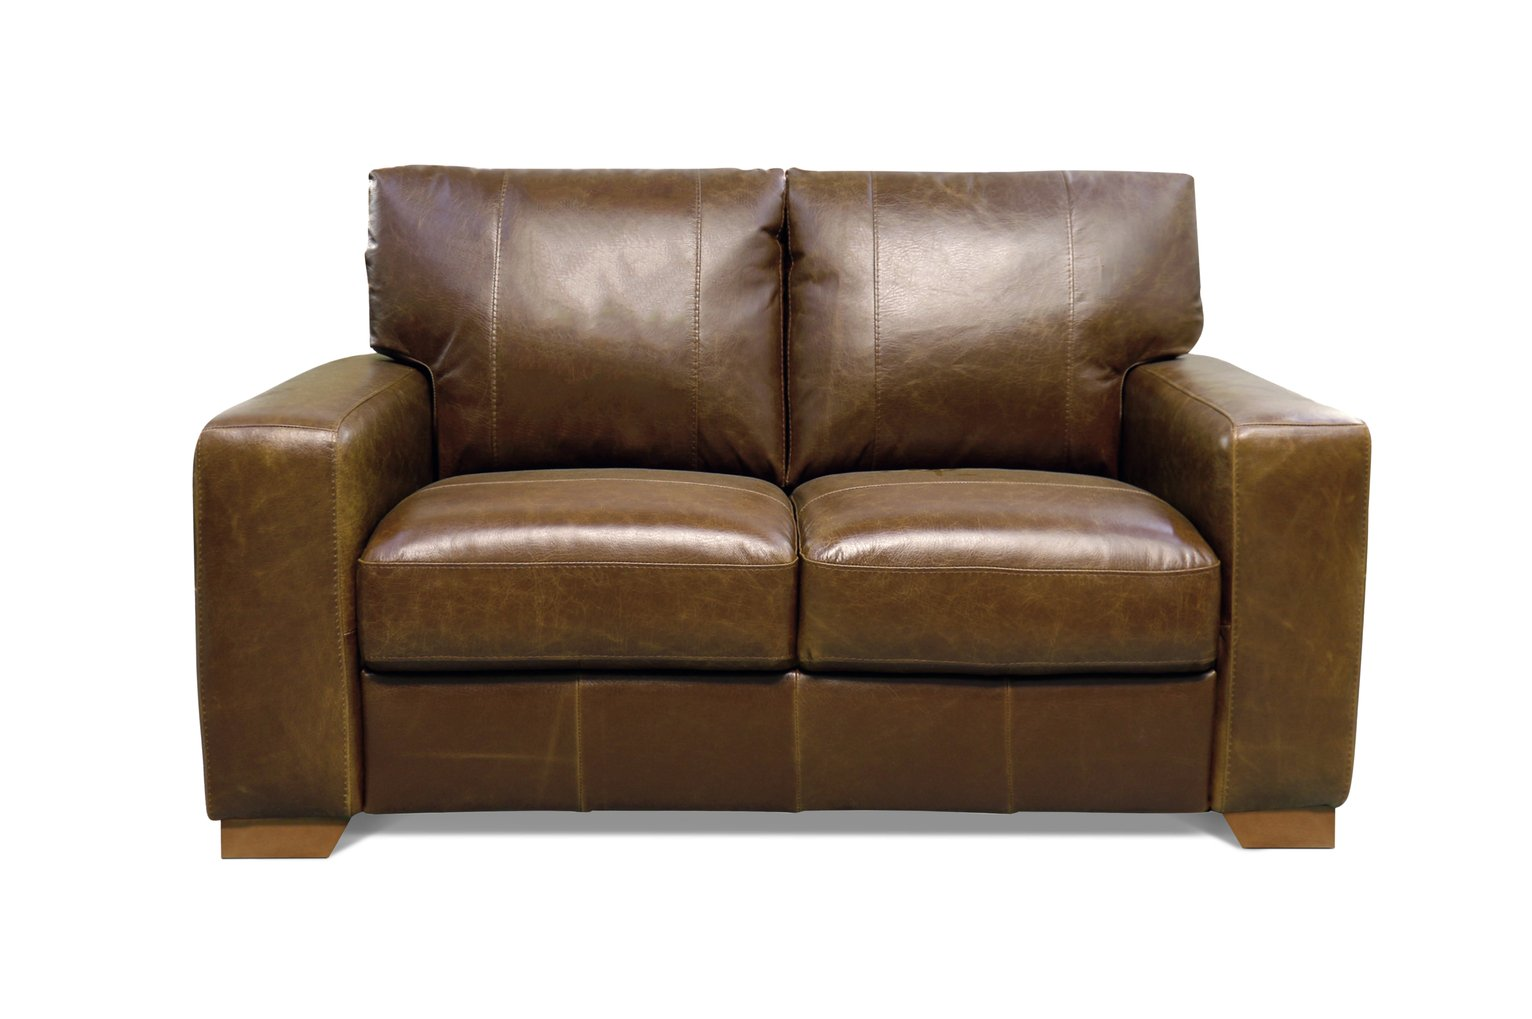 Habitat Eton 2 Seater Leather Sofa - Tan